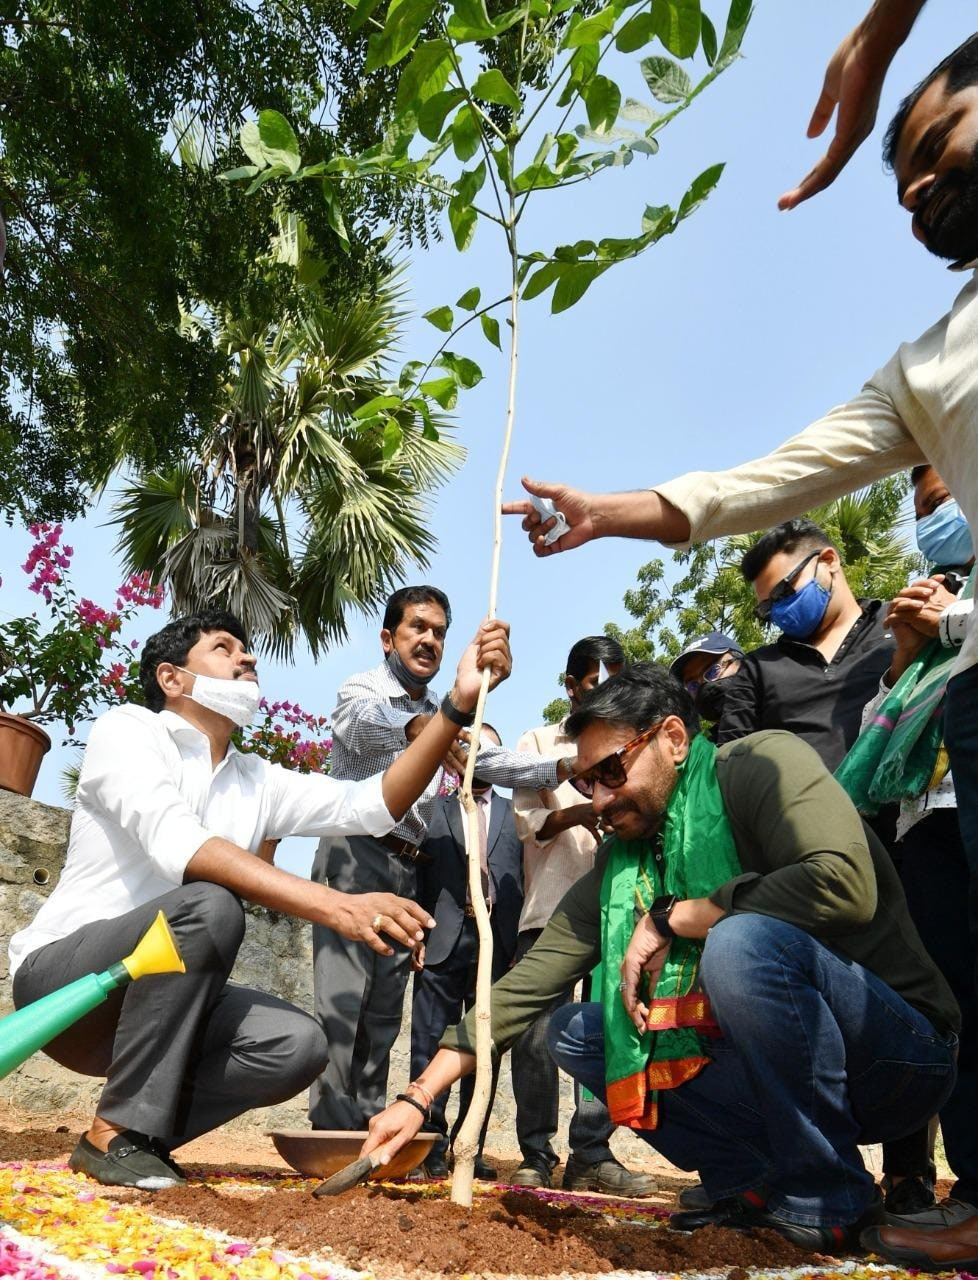 Green India challenge-এ অংশ নিয়ে হায়দরাবাদে রামোজি ফিল্ম সিটিতে গাছের চারা লাগালেন অজয় দেবগণ